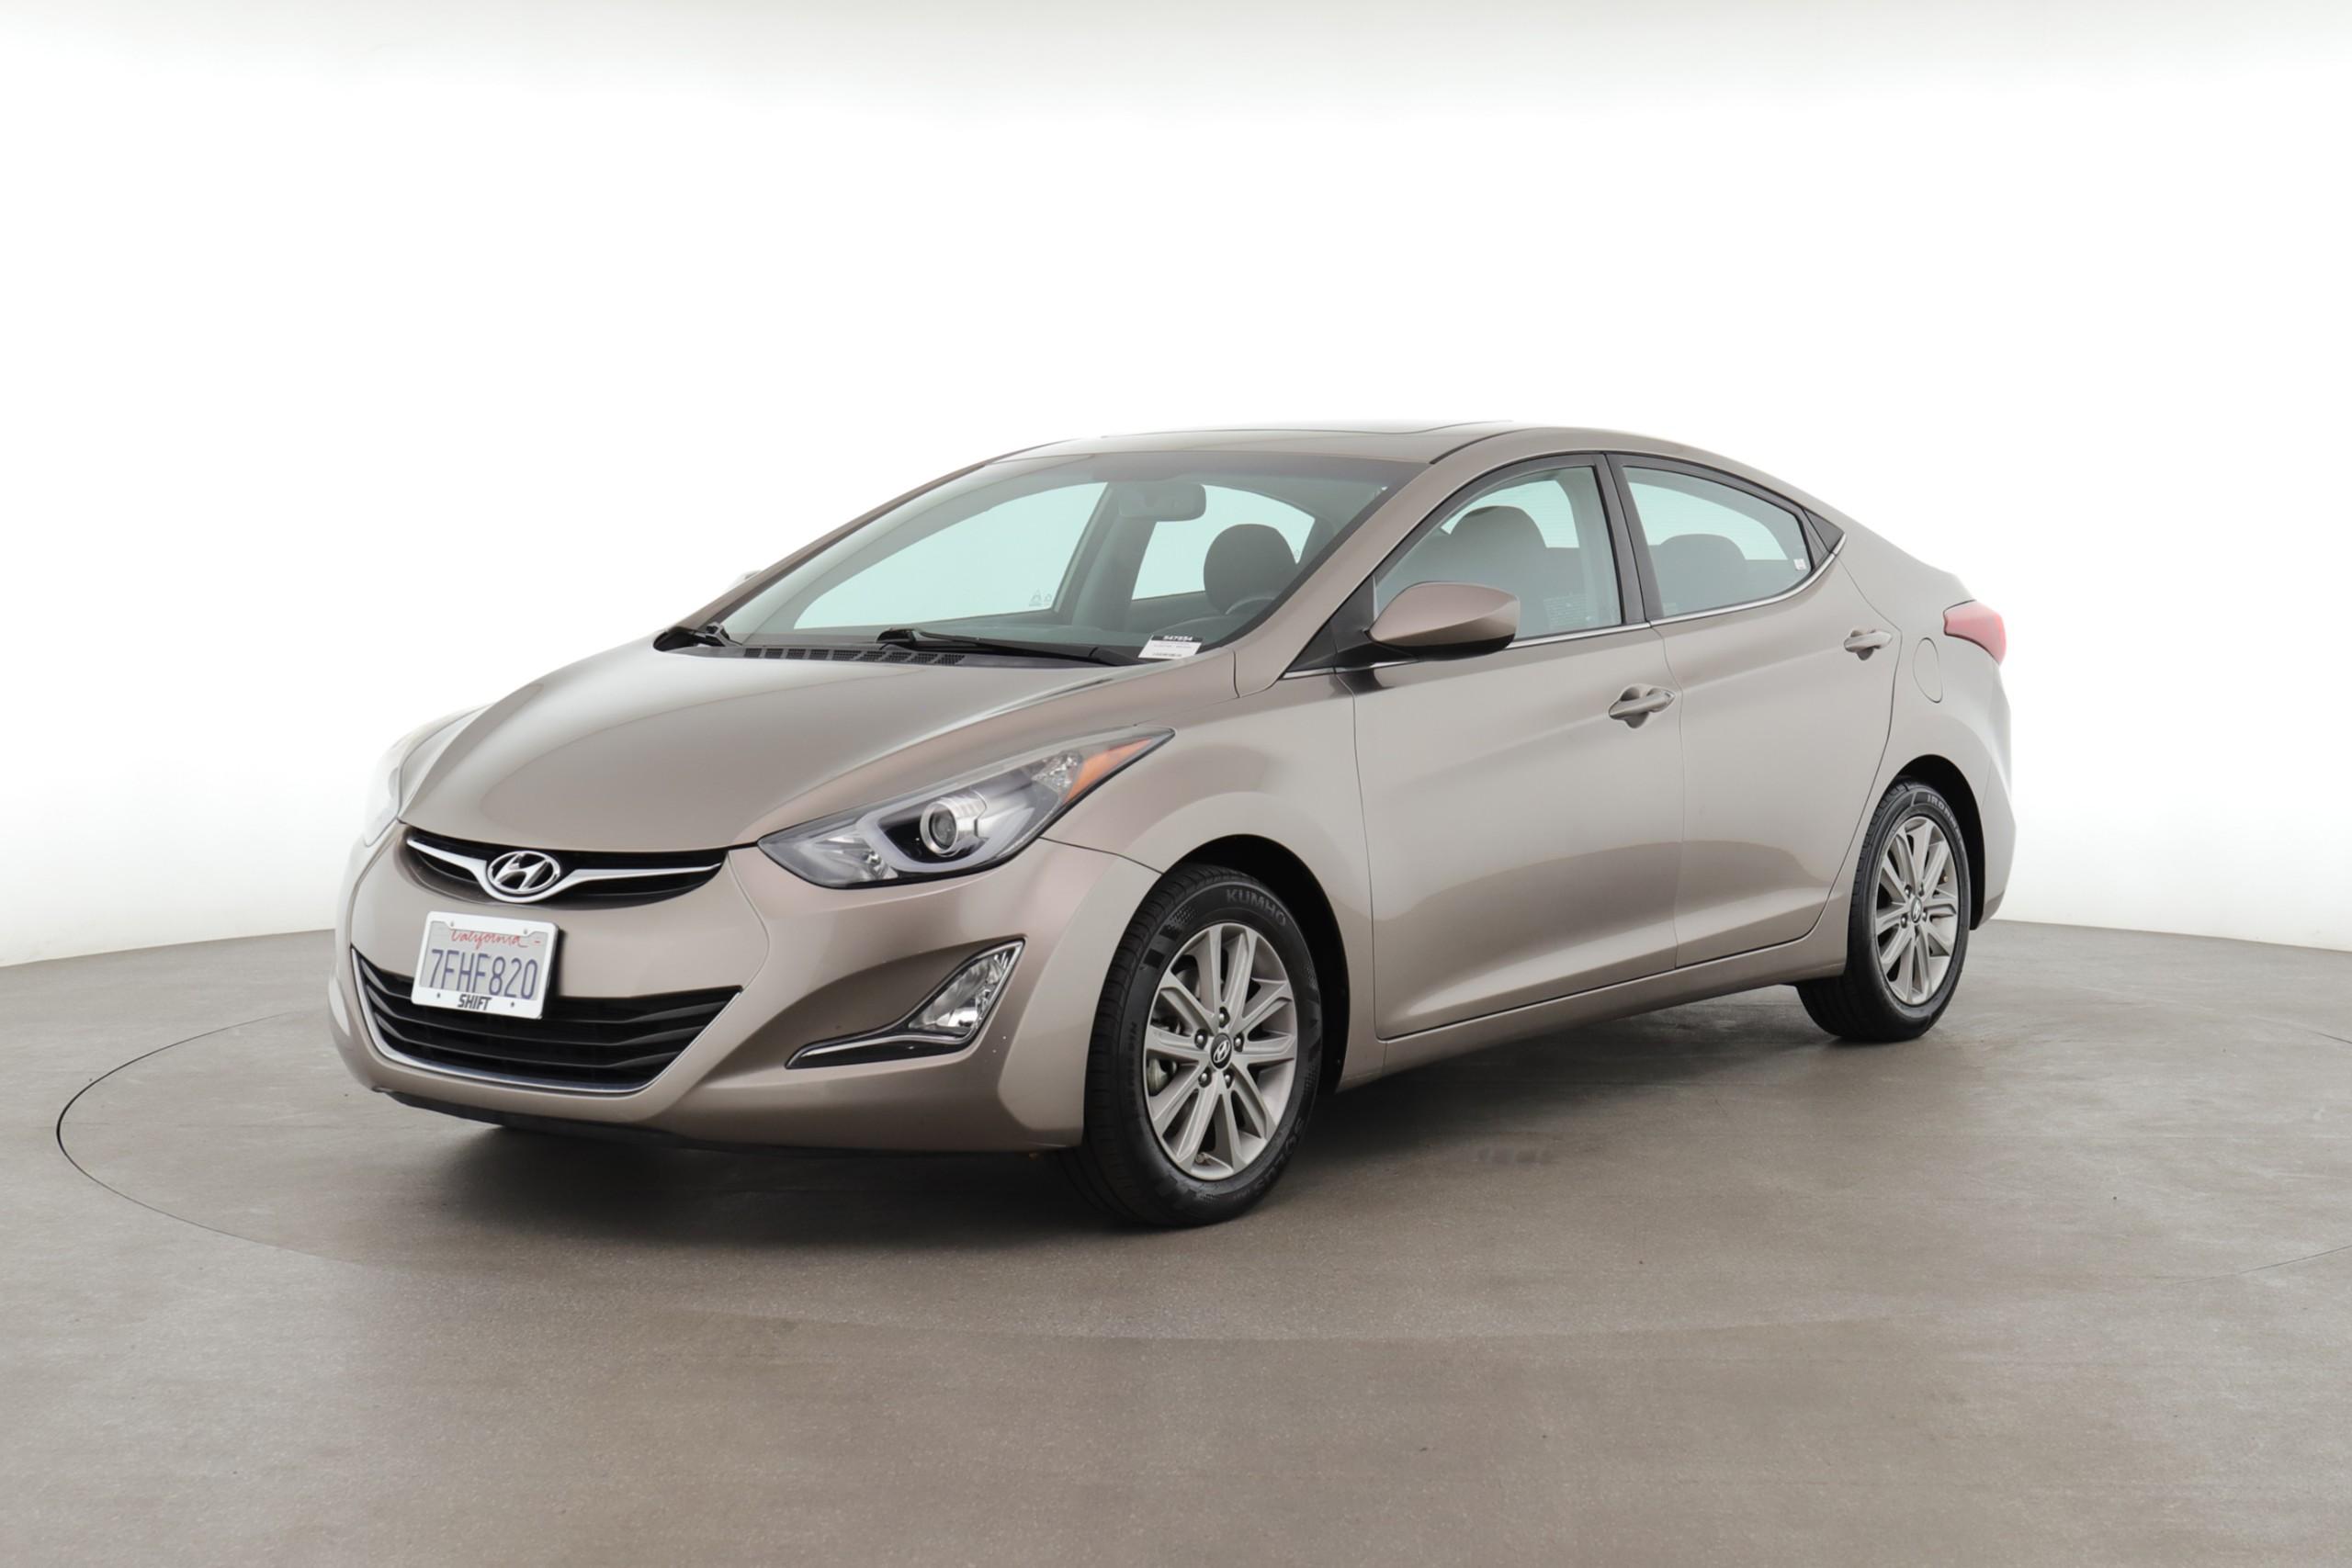 Is Elantra a Good Car Choice? Here's Our Hyundai Elantra Review